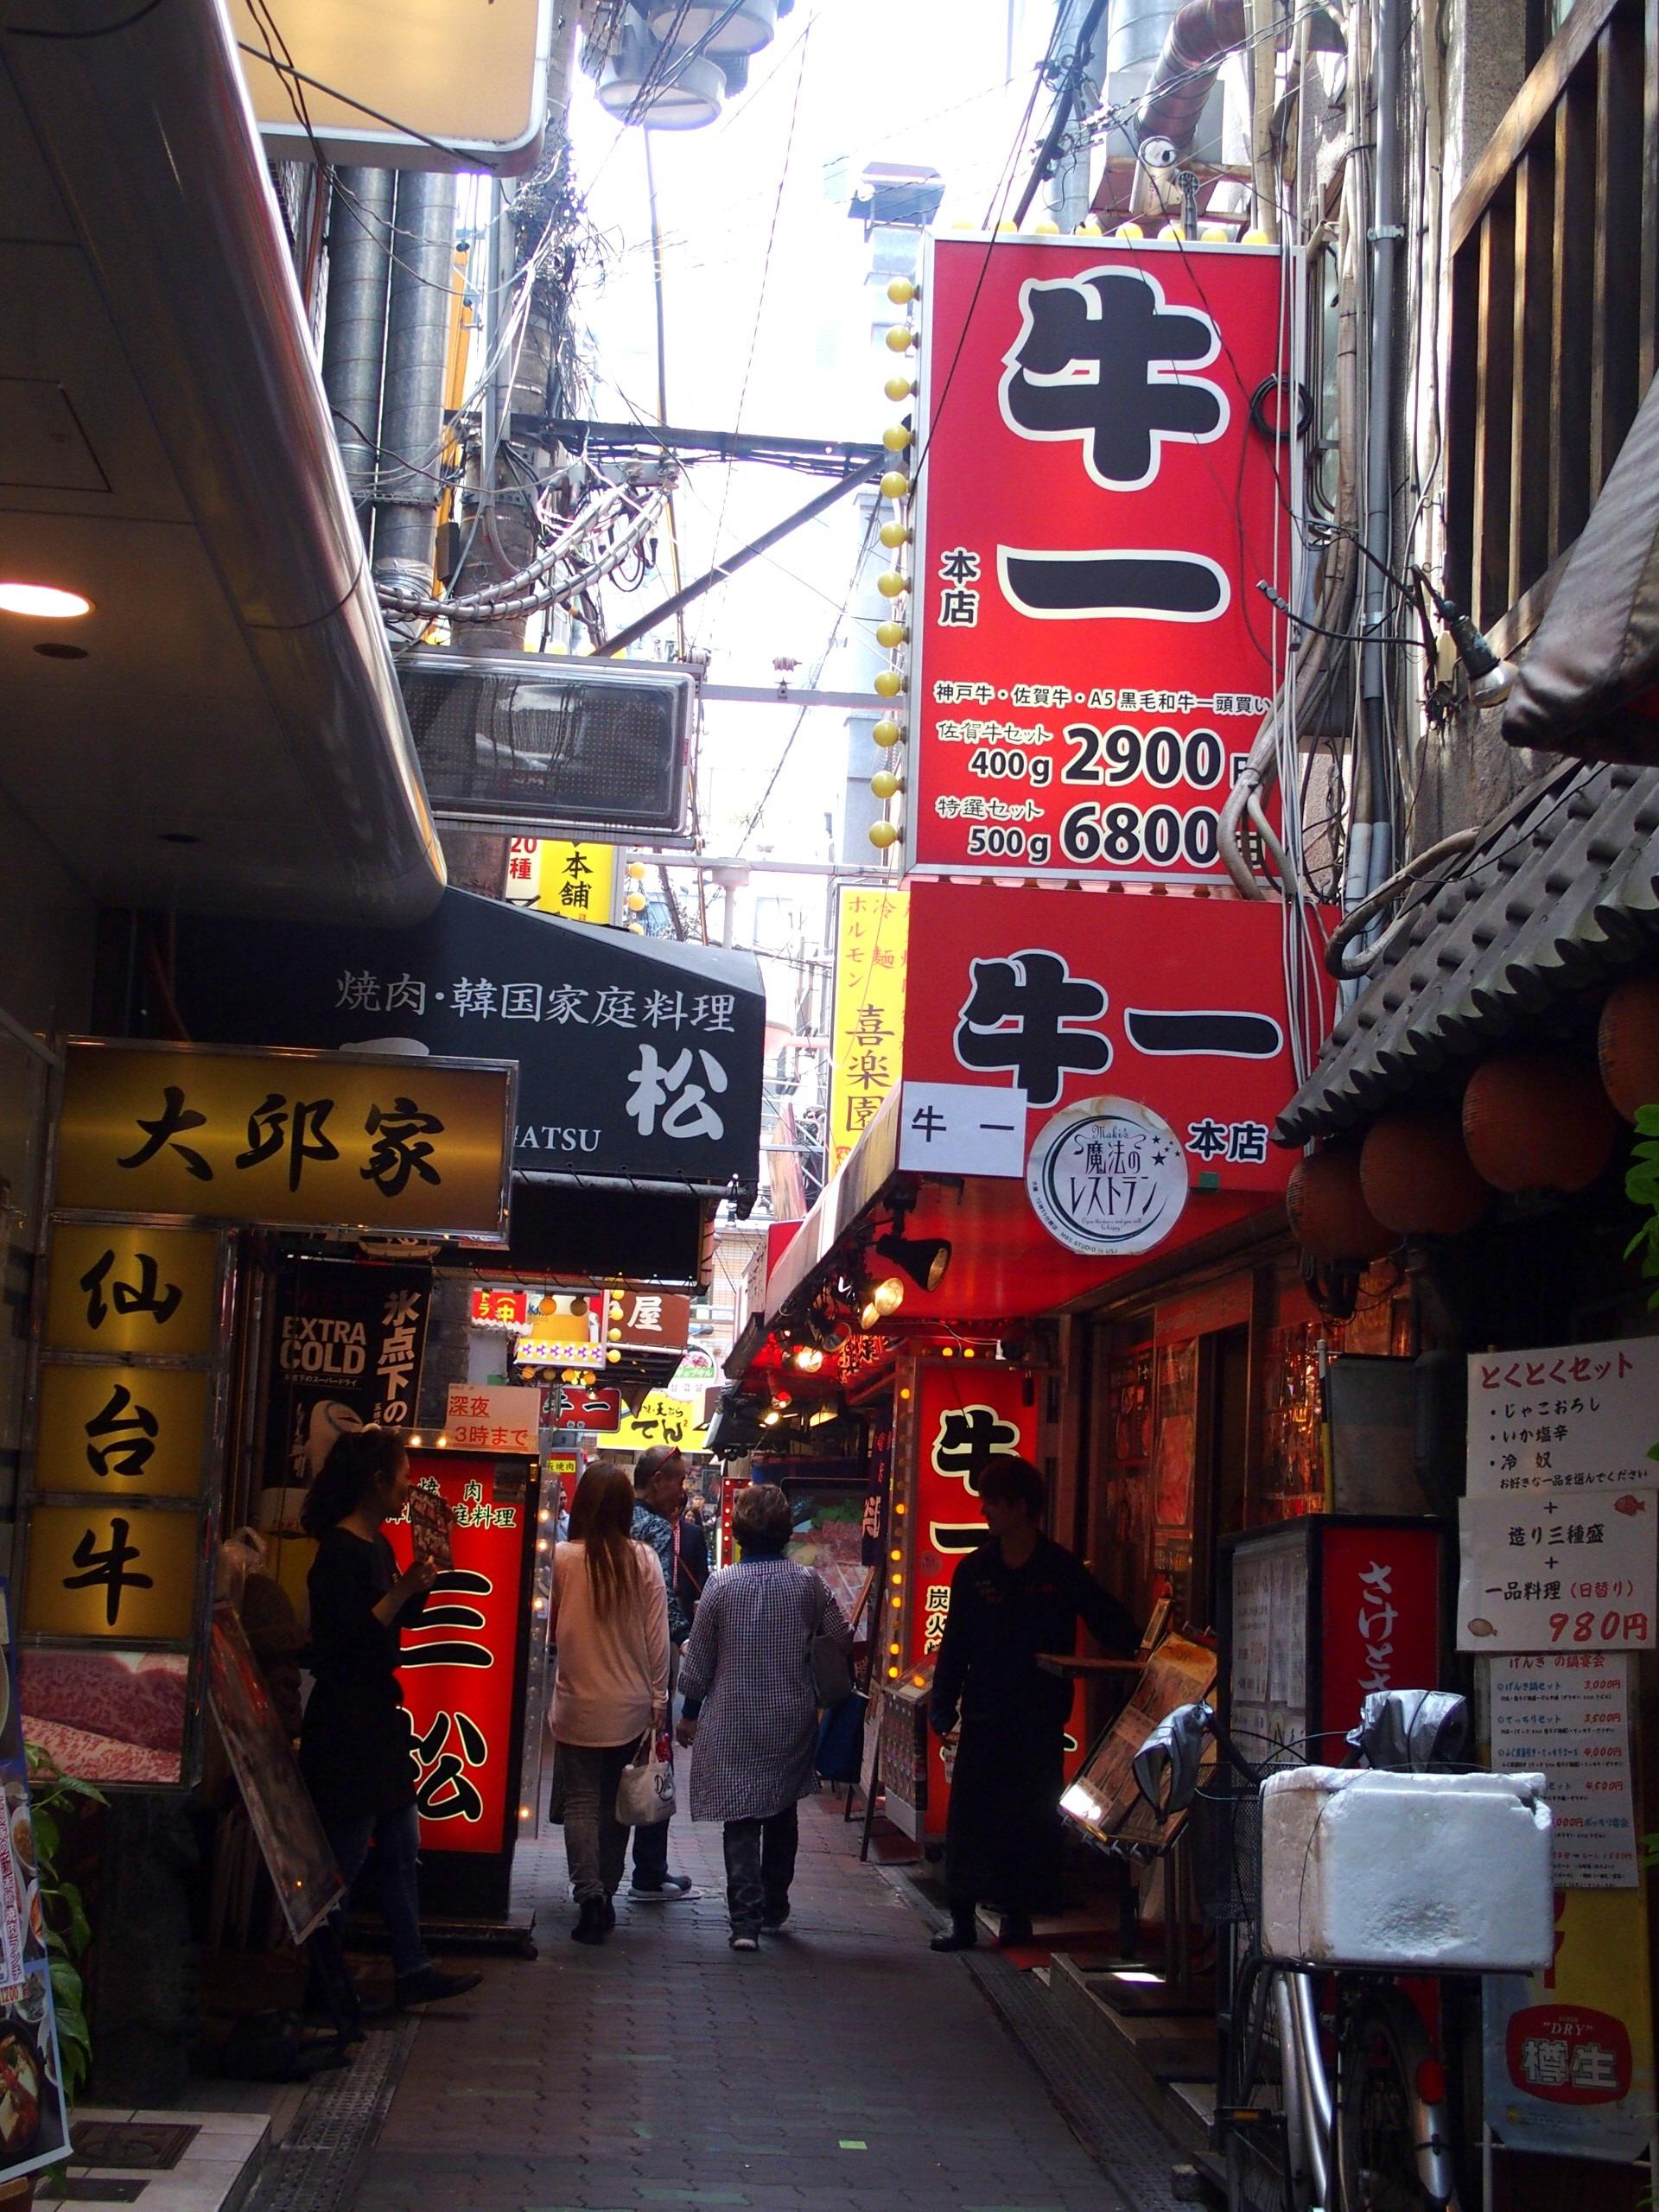 Ruelle Den Den Town visite à Osaka Japon